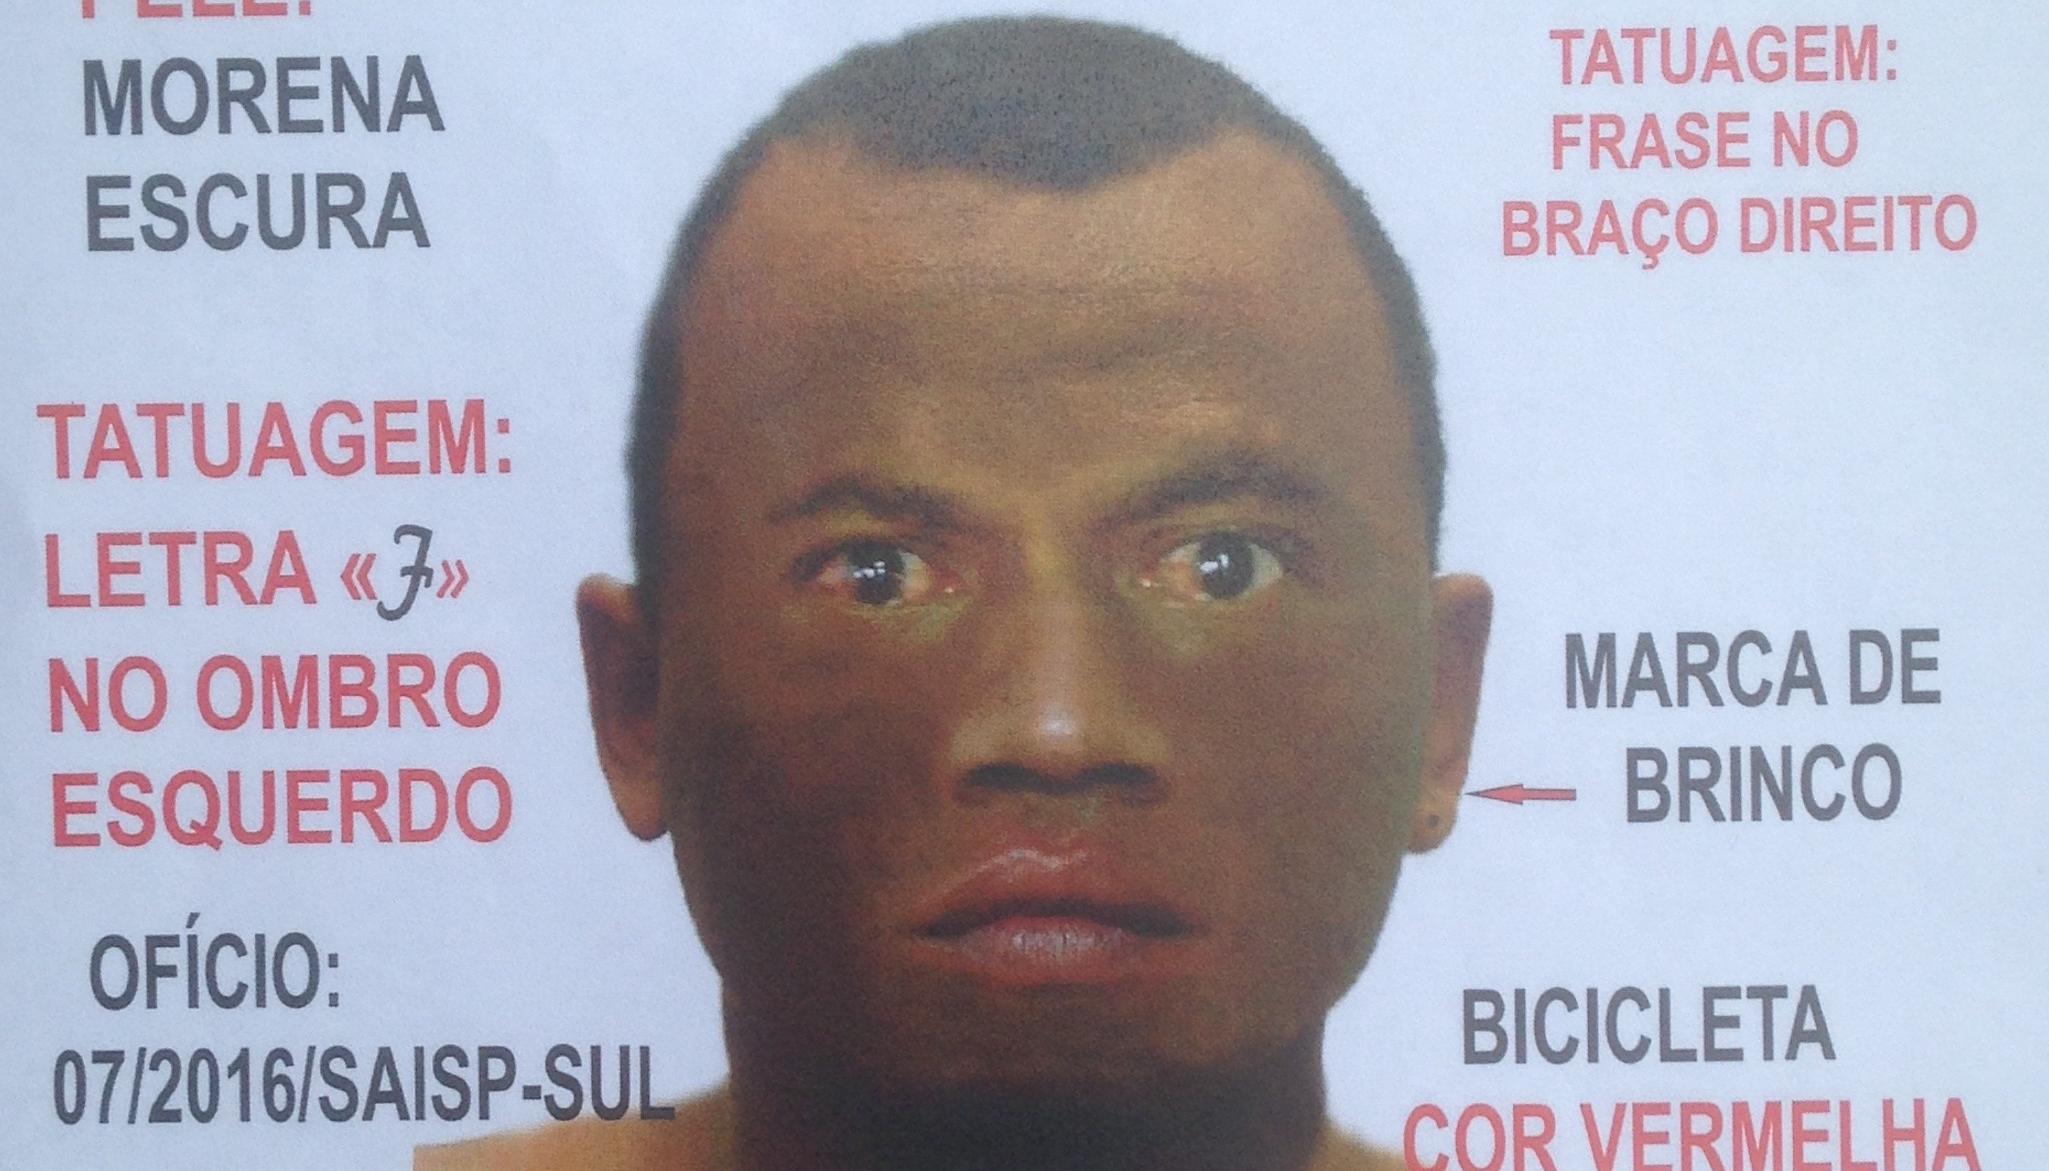 Polícia Civil divulga novo retrato do suspeito de raptar e abusar de menina na Capital